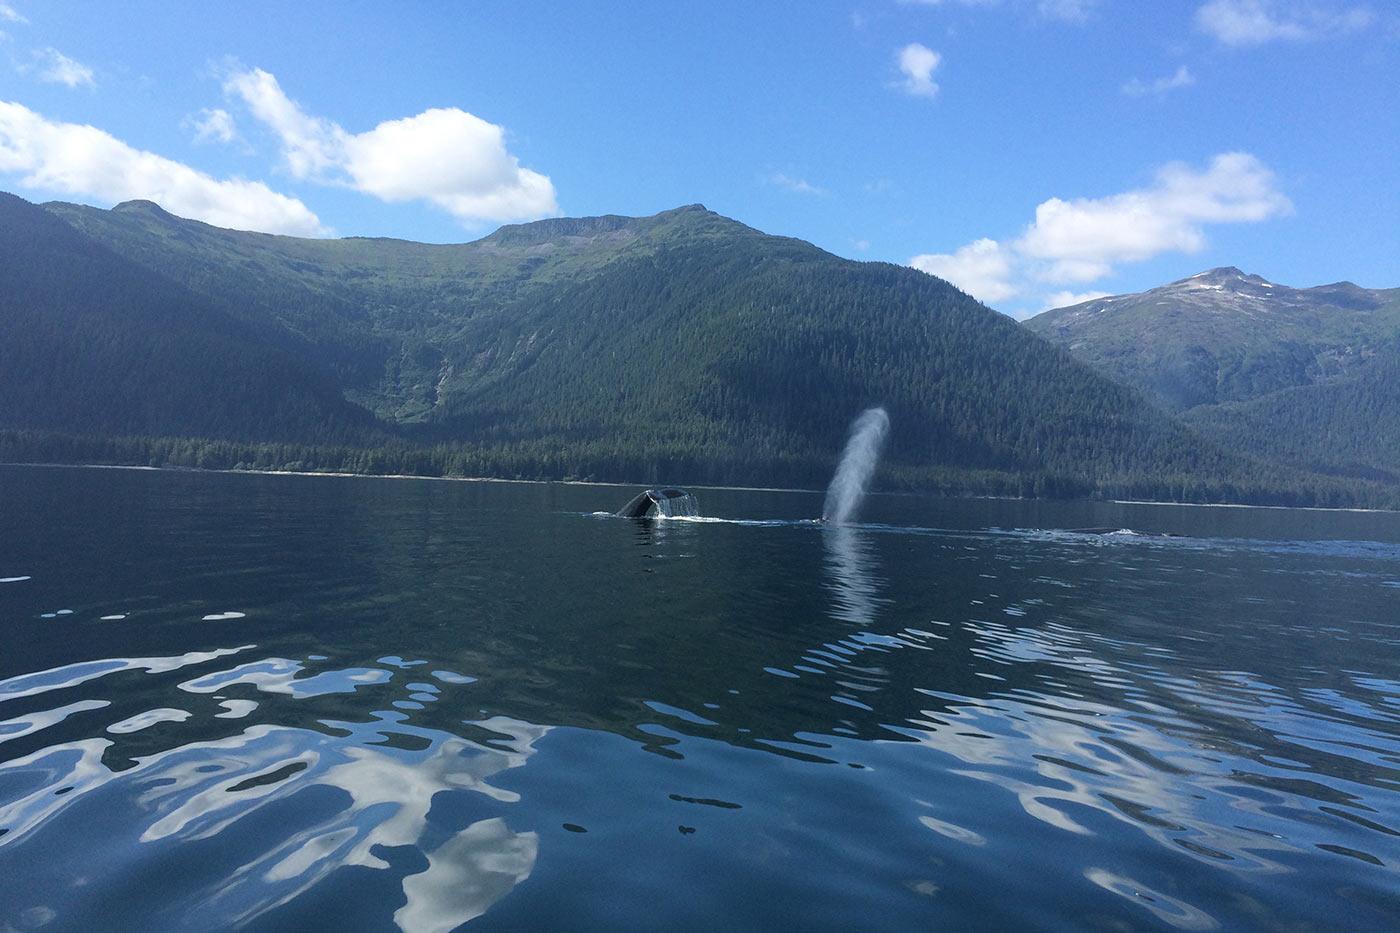 Yacht Charter Vacation In Alaska